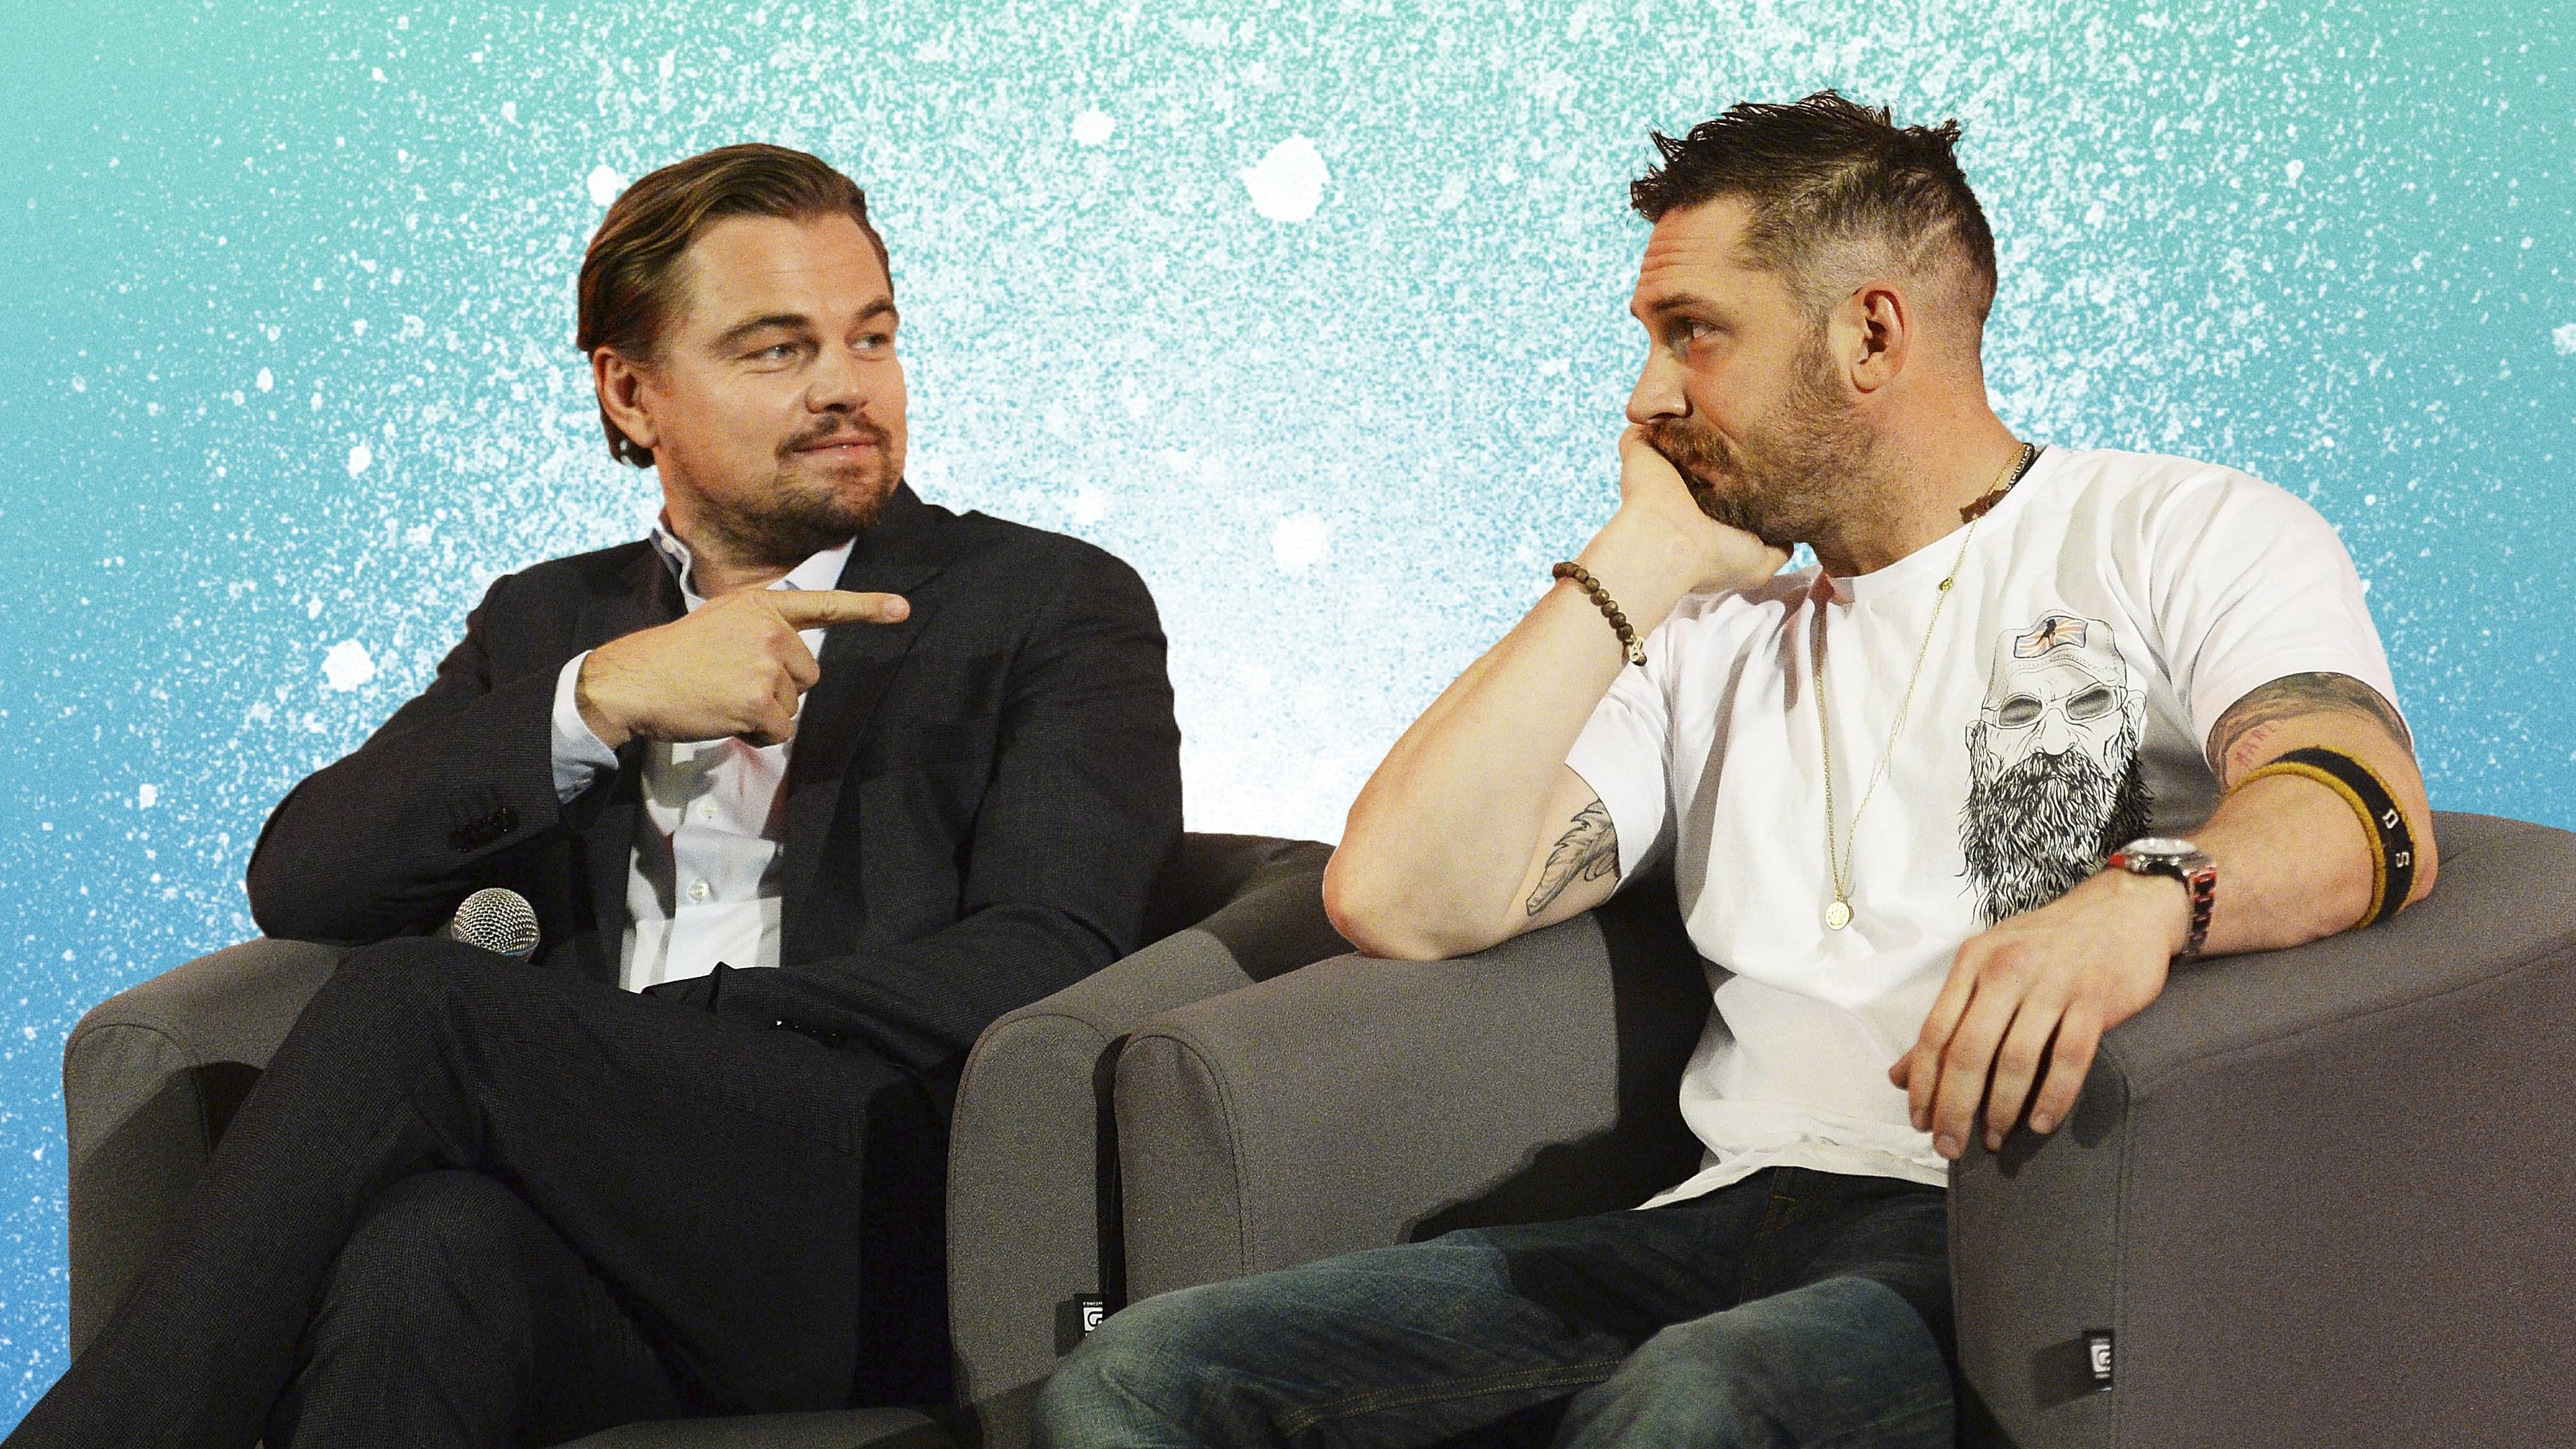 'Hollywood'un En Küçük 10 Penisi' Listesinde: DiCaprio, Jude Law ve Tom Hardy!